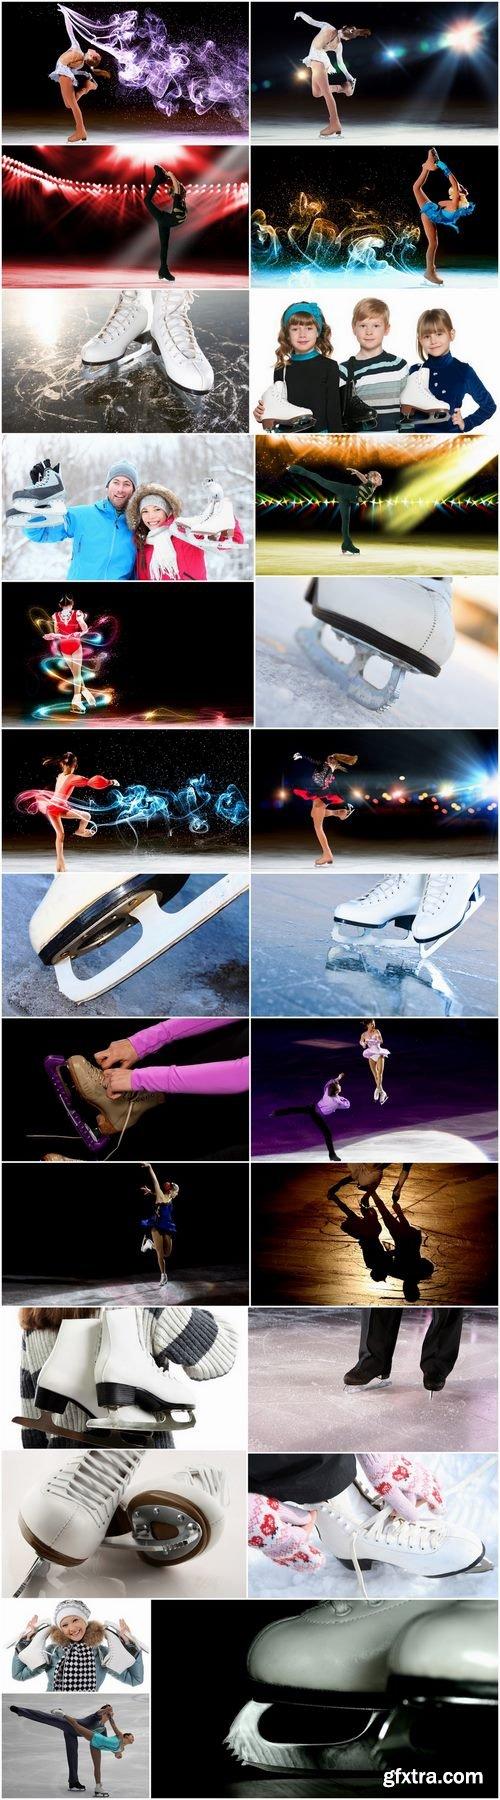 Figure skating 25 HQ Jpeg